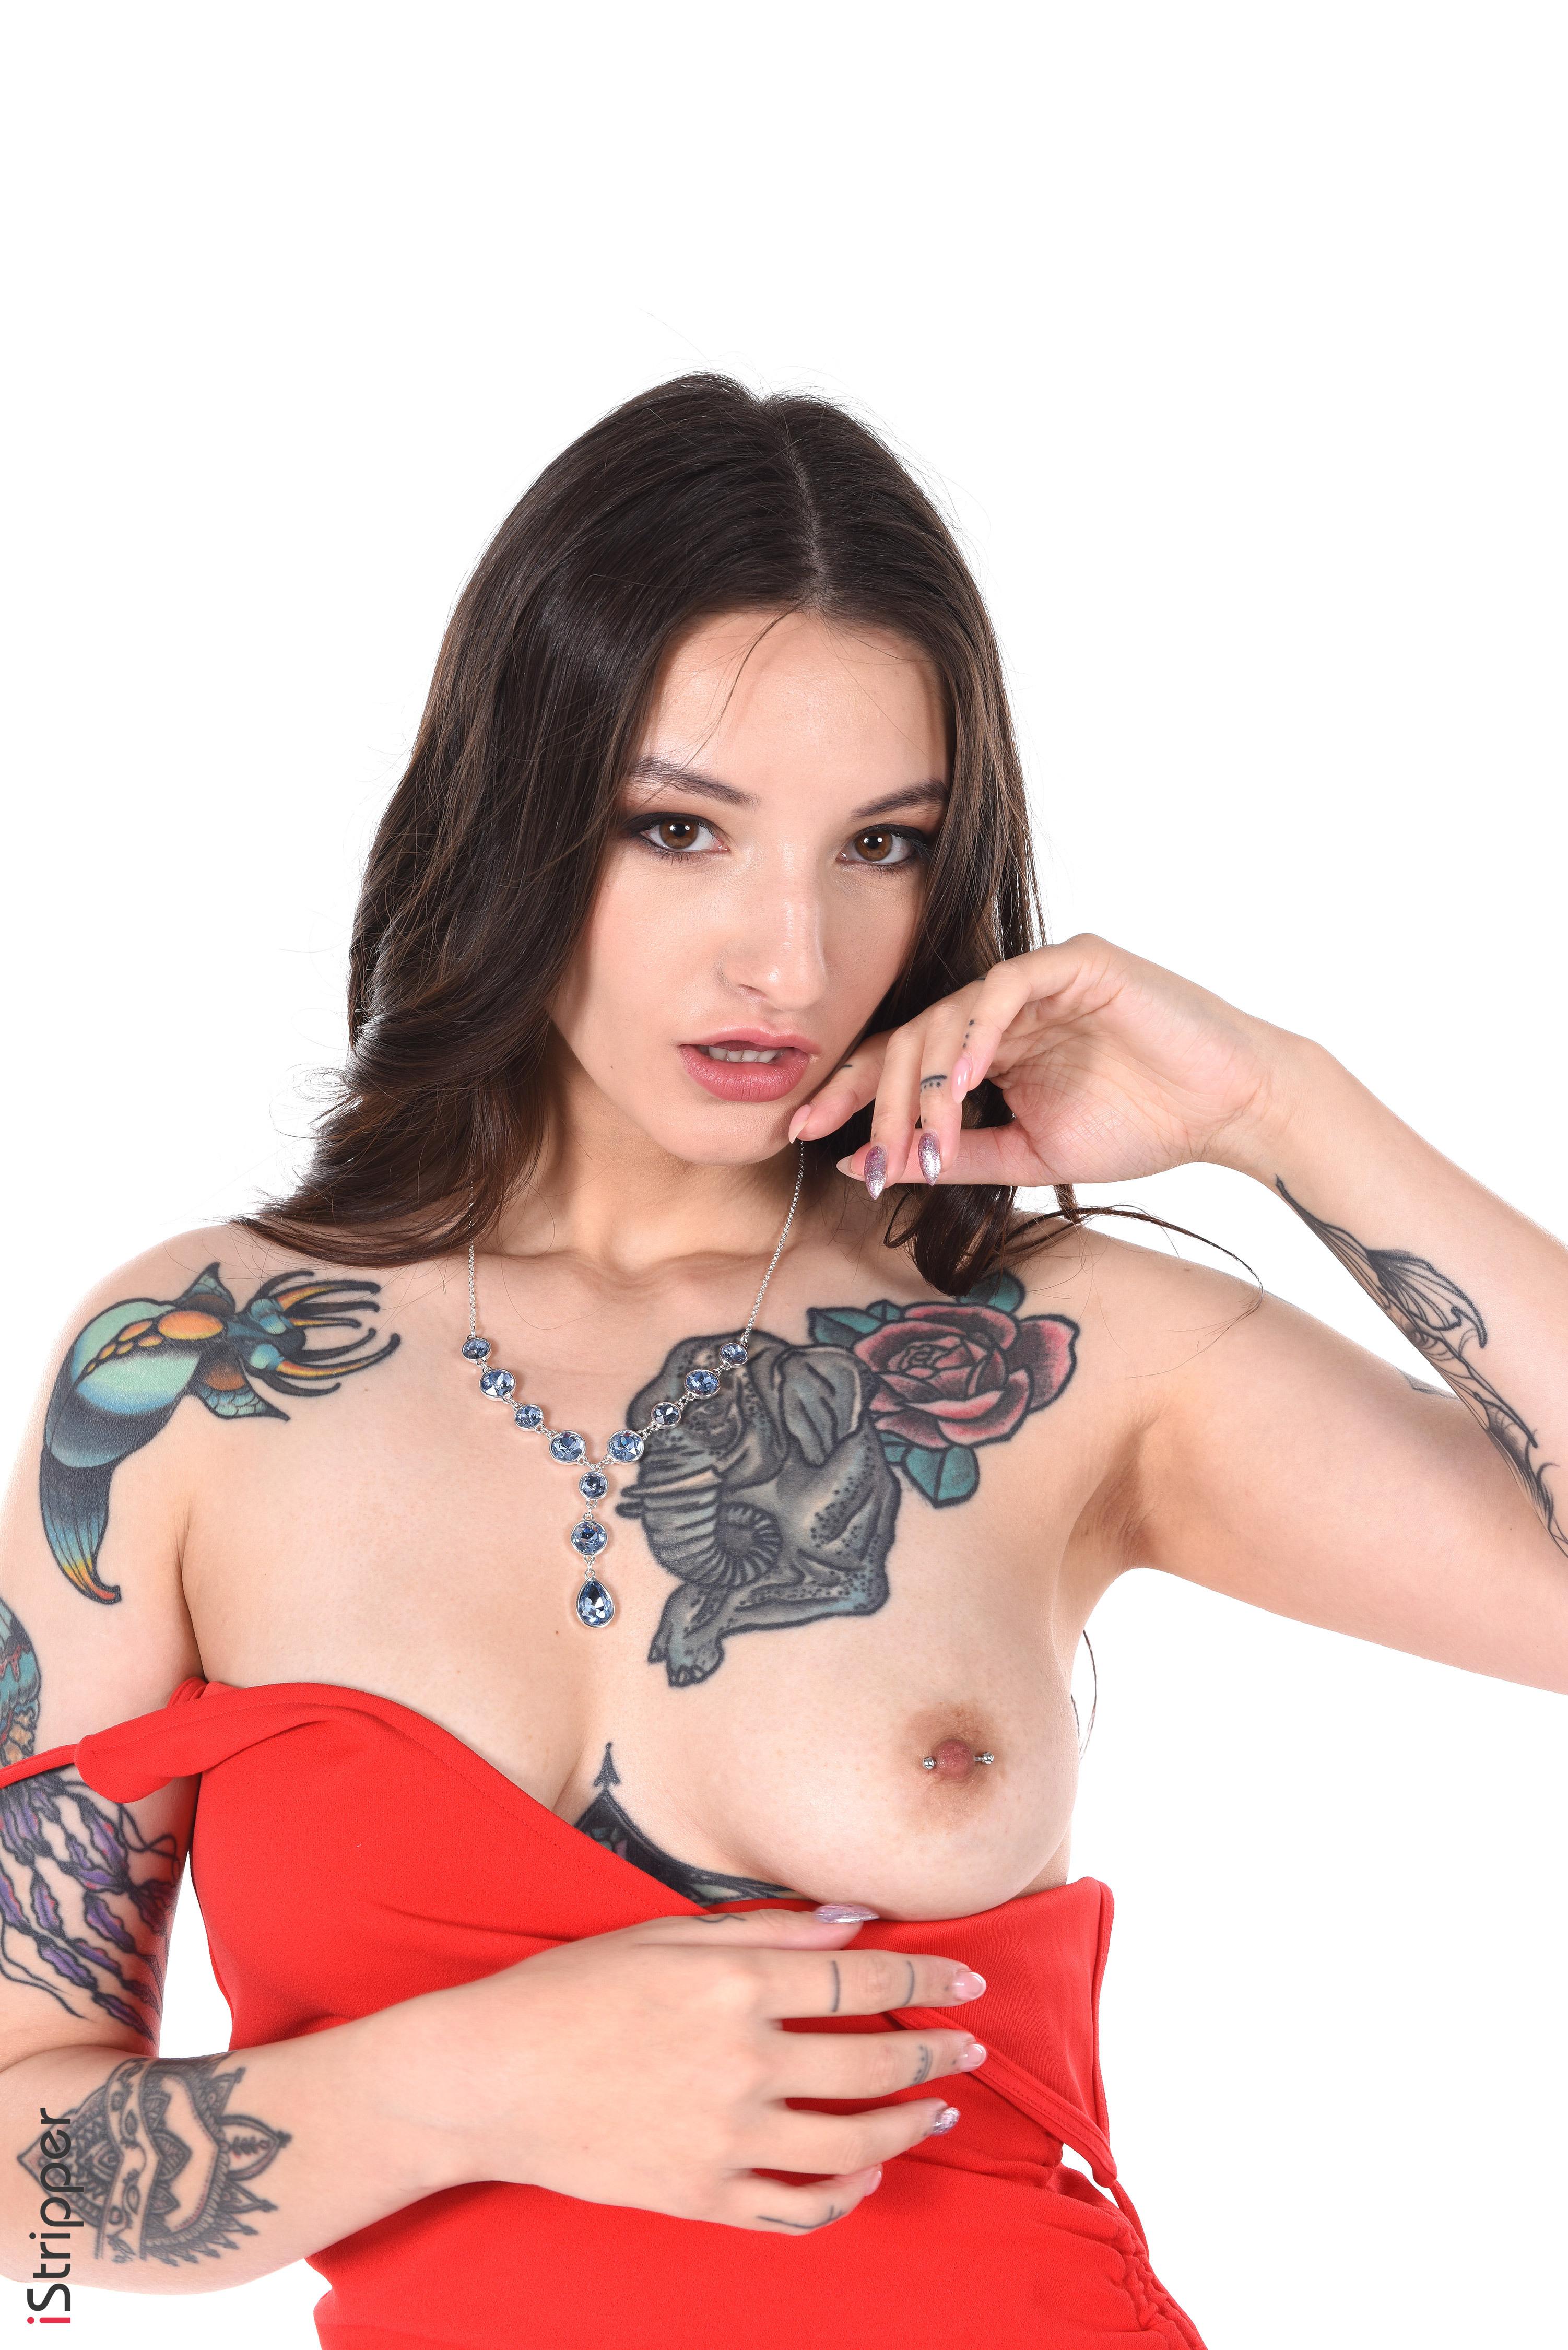 sexy striptease seductiom